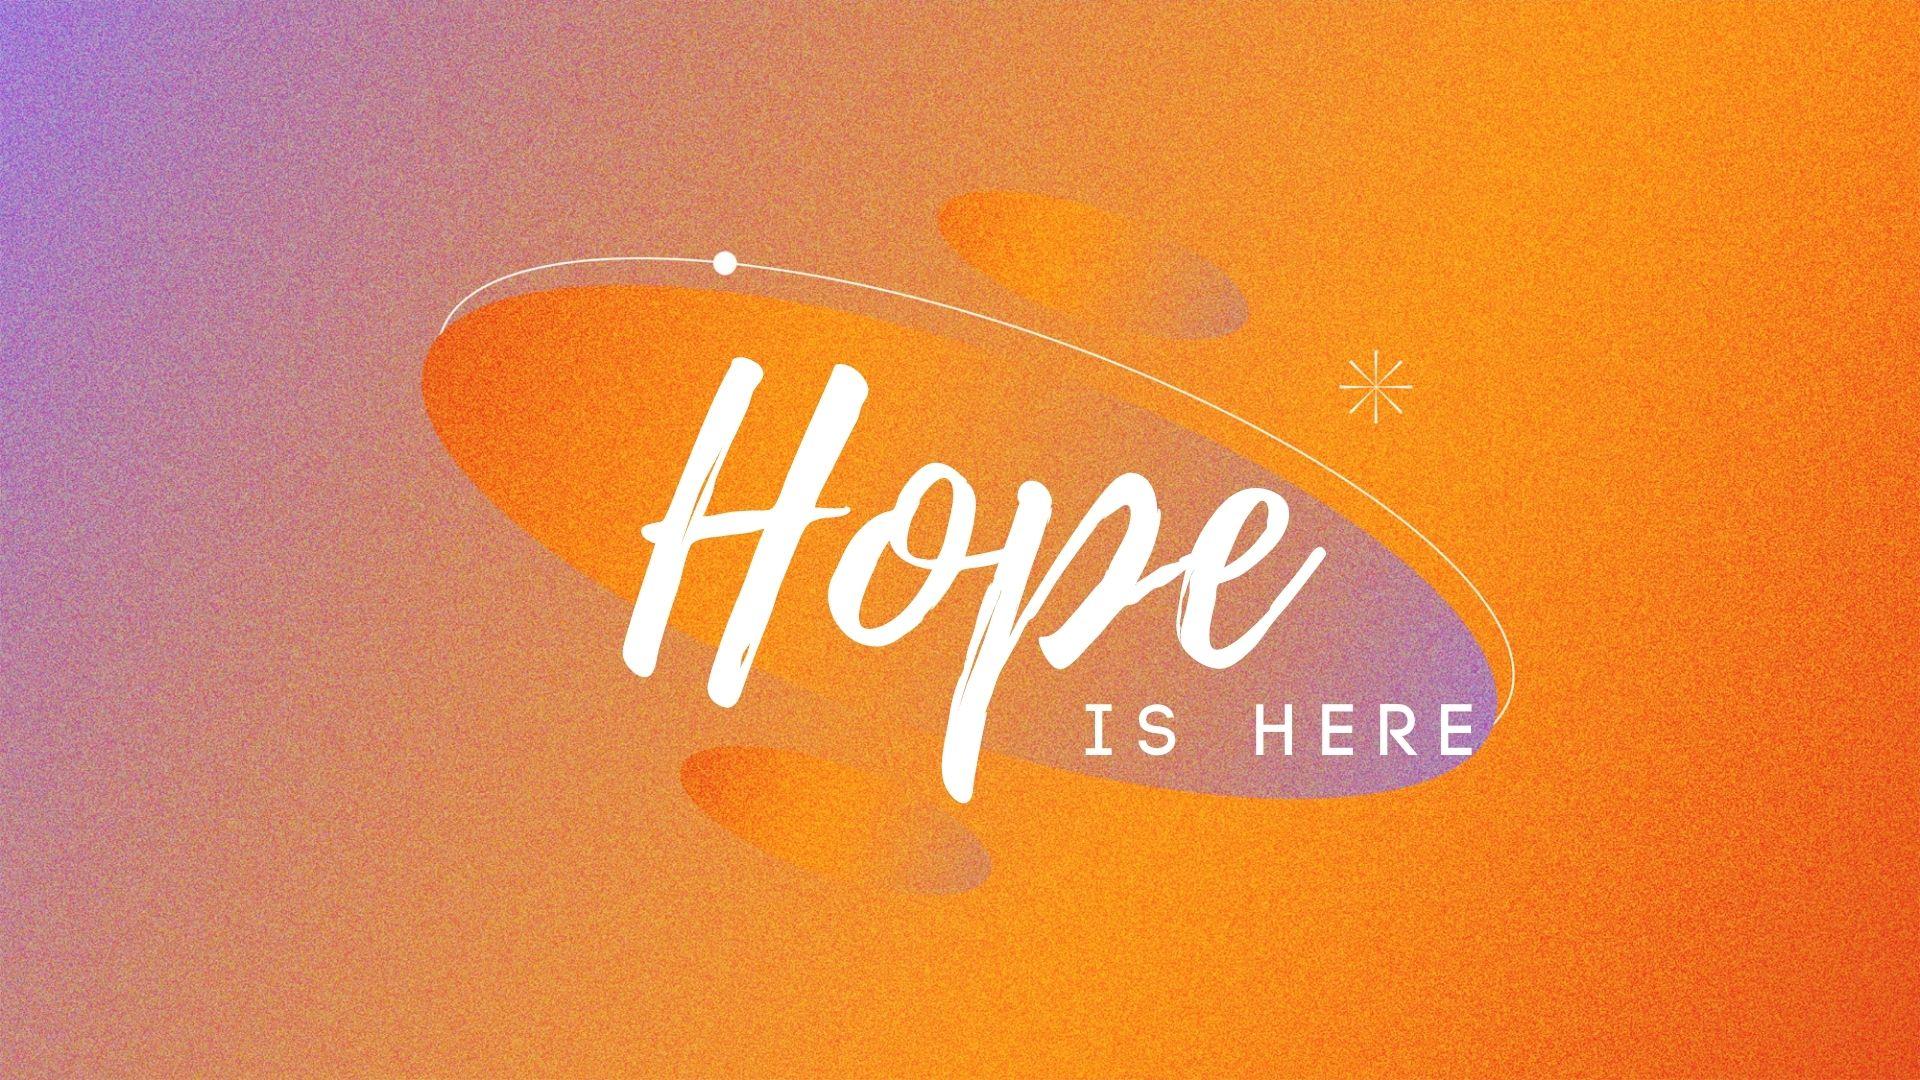 HOPE IS HERE LOGO-MAL